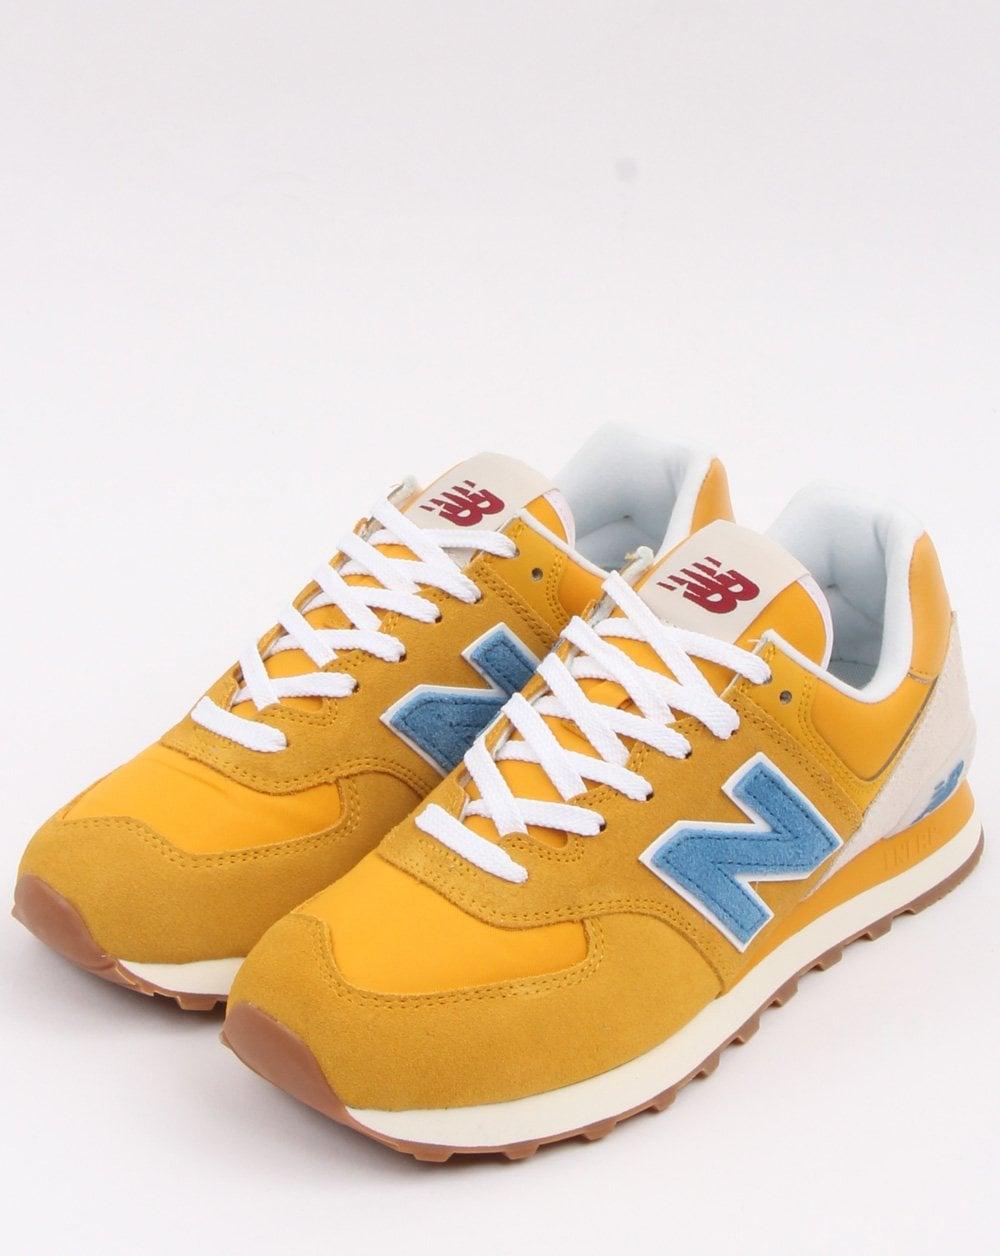 New Balance 574 Varsity Gold